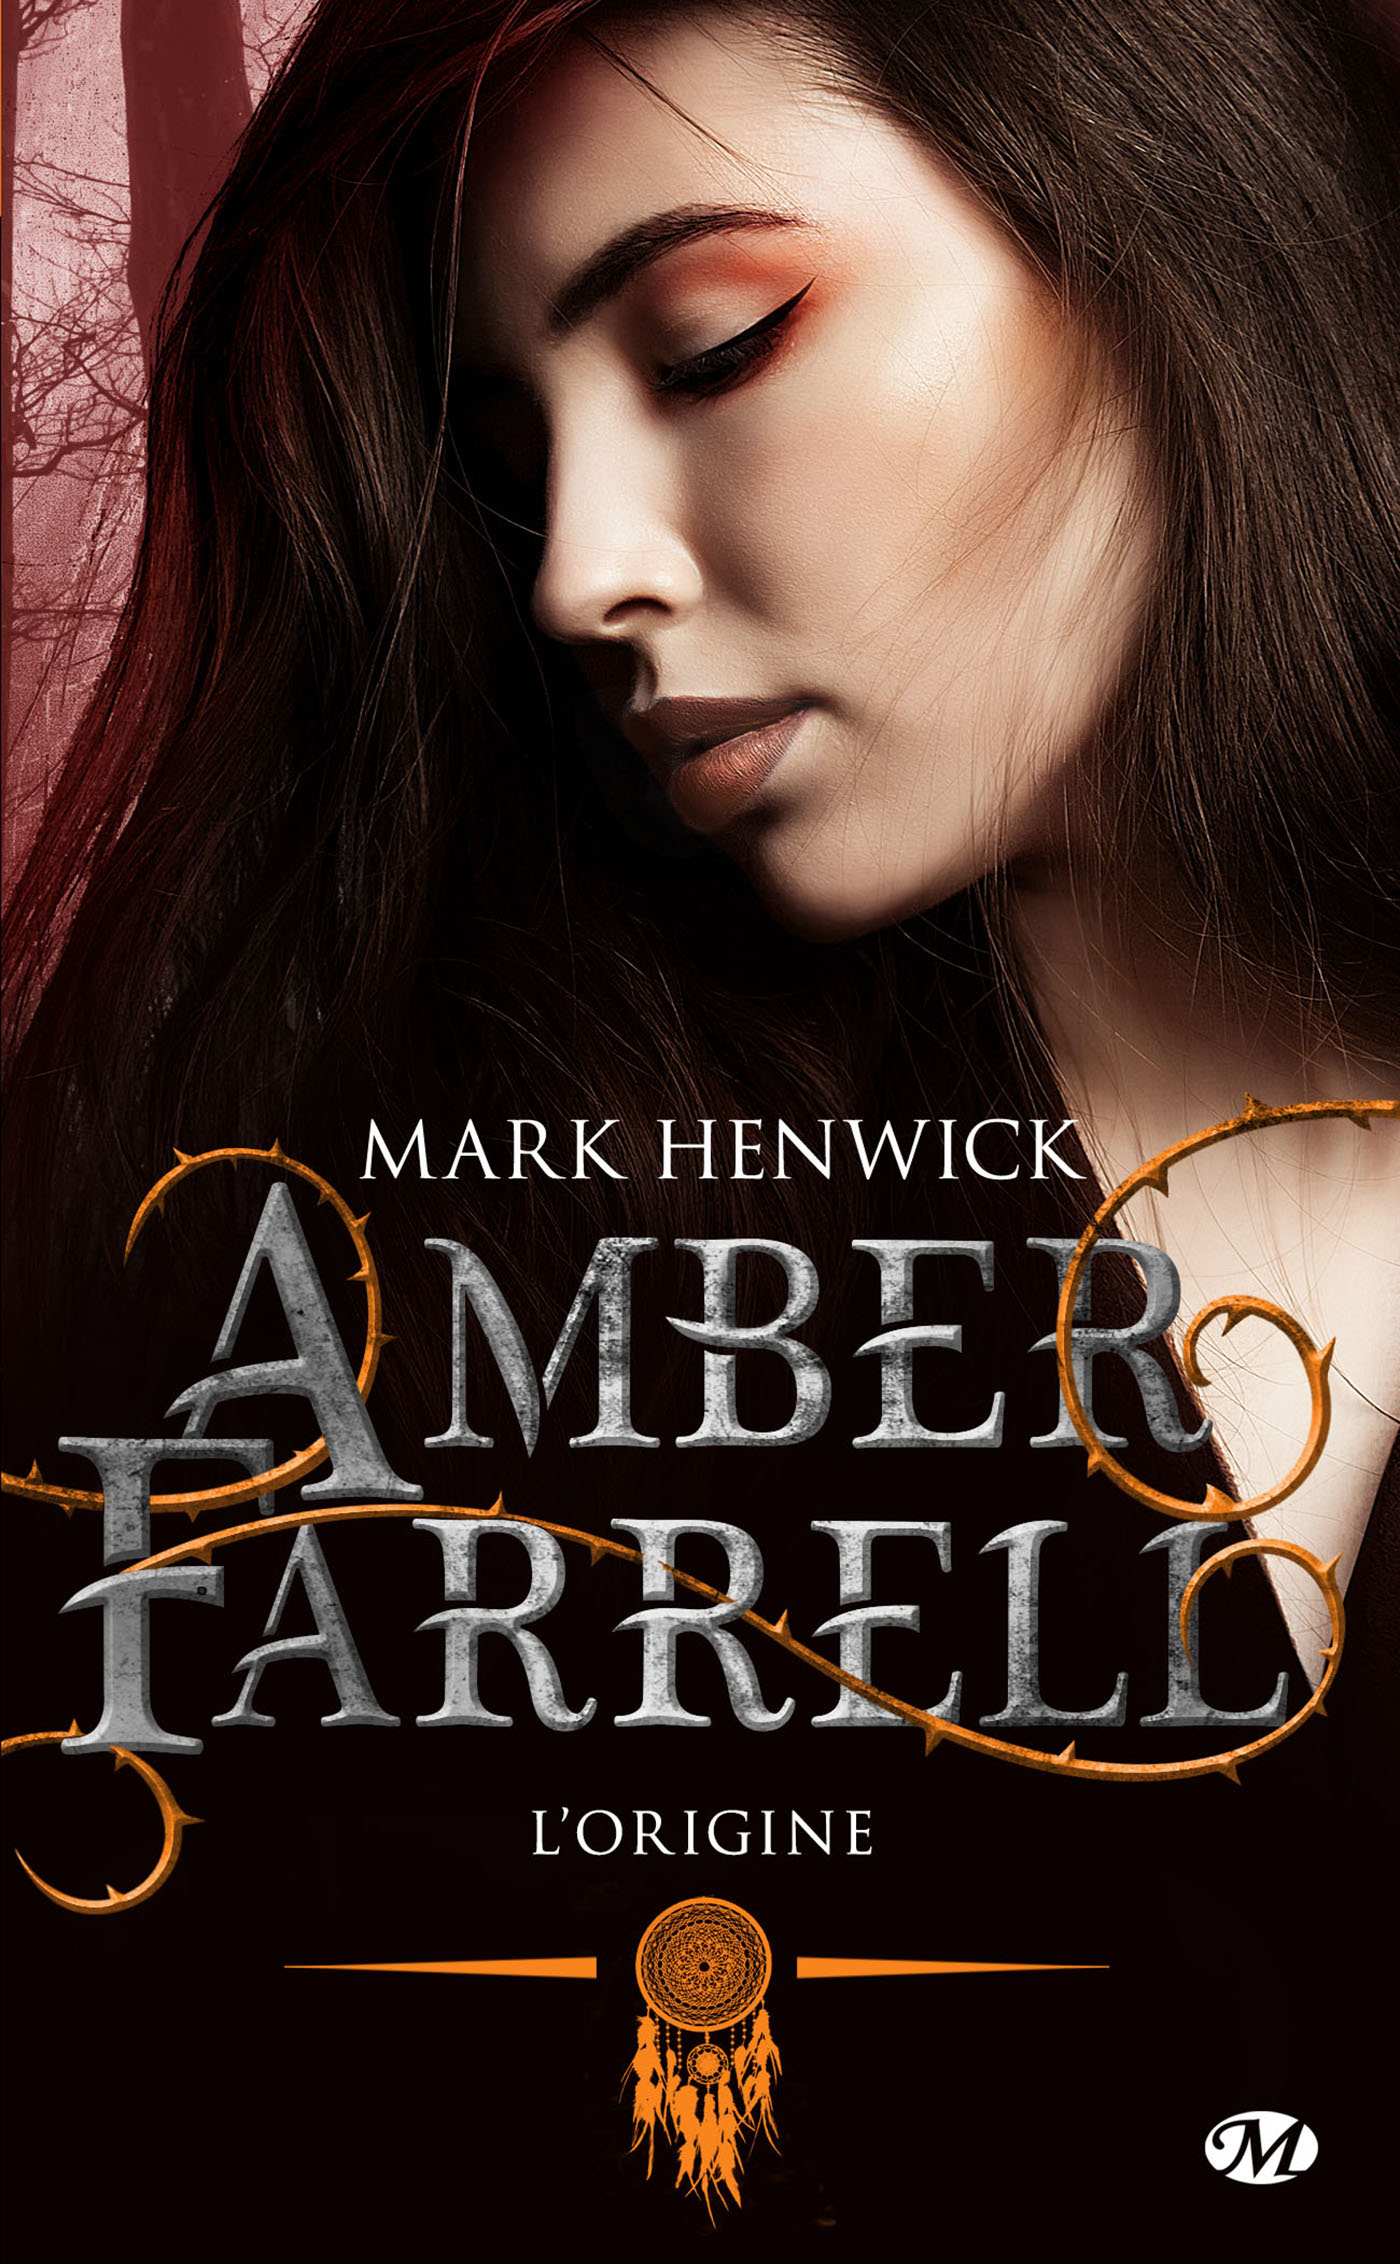 cdn1.booknode.com/book_cover/1082/full/amber-farrell-hs-l-origine-1082294.jpg